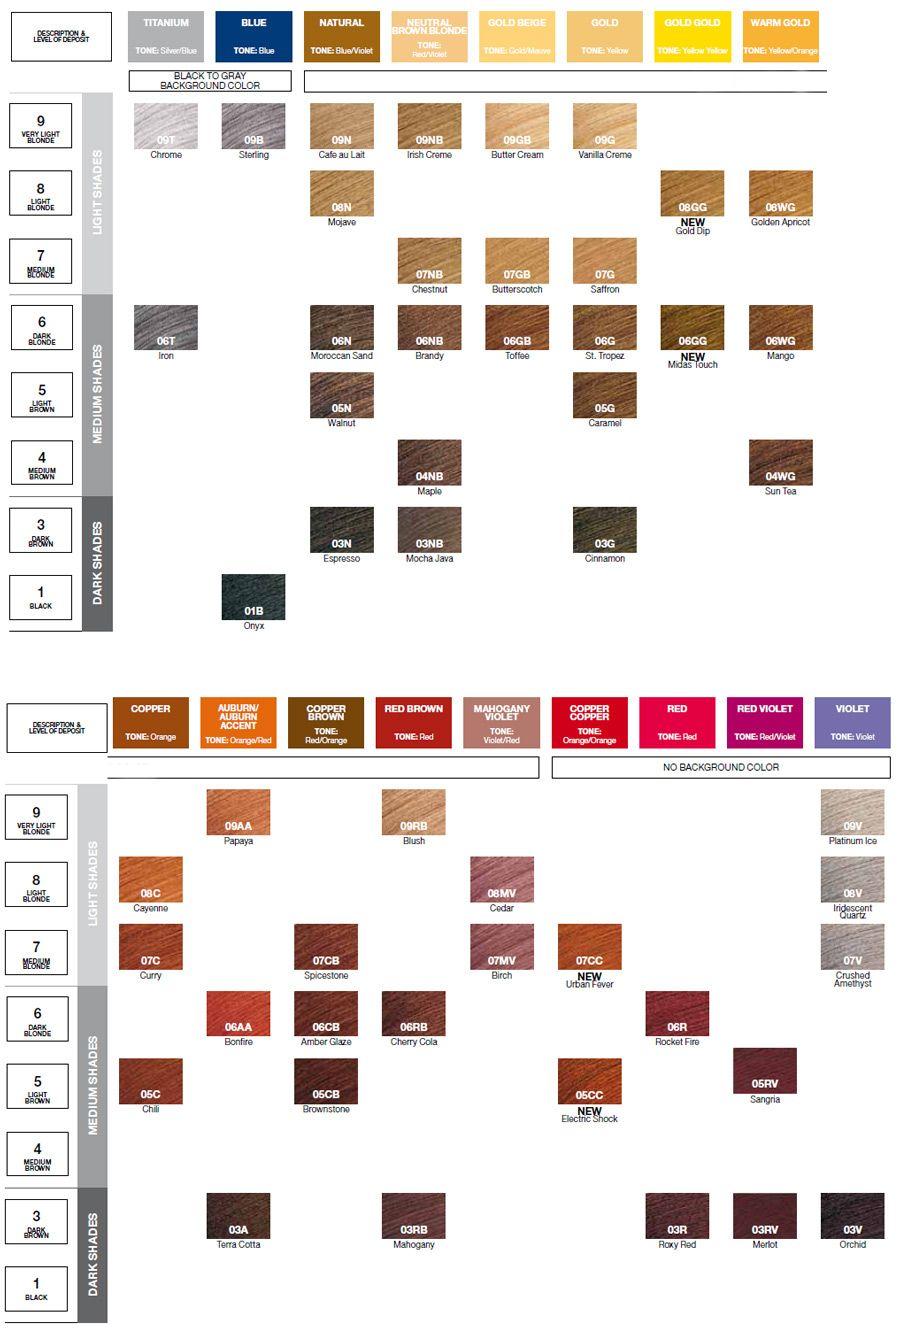 Redken shades eq color gloss chart also wella charm demi permanent hair shade pallete rh pinterest